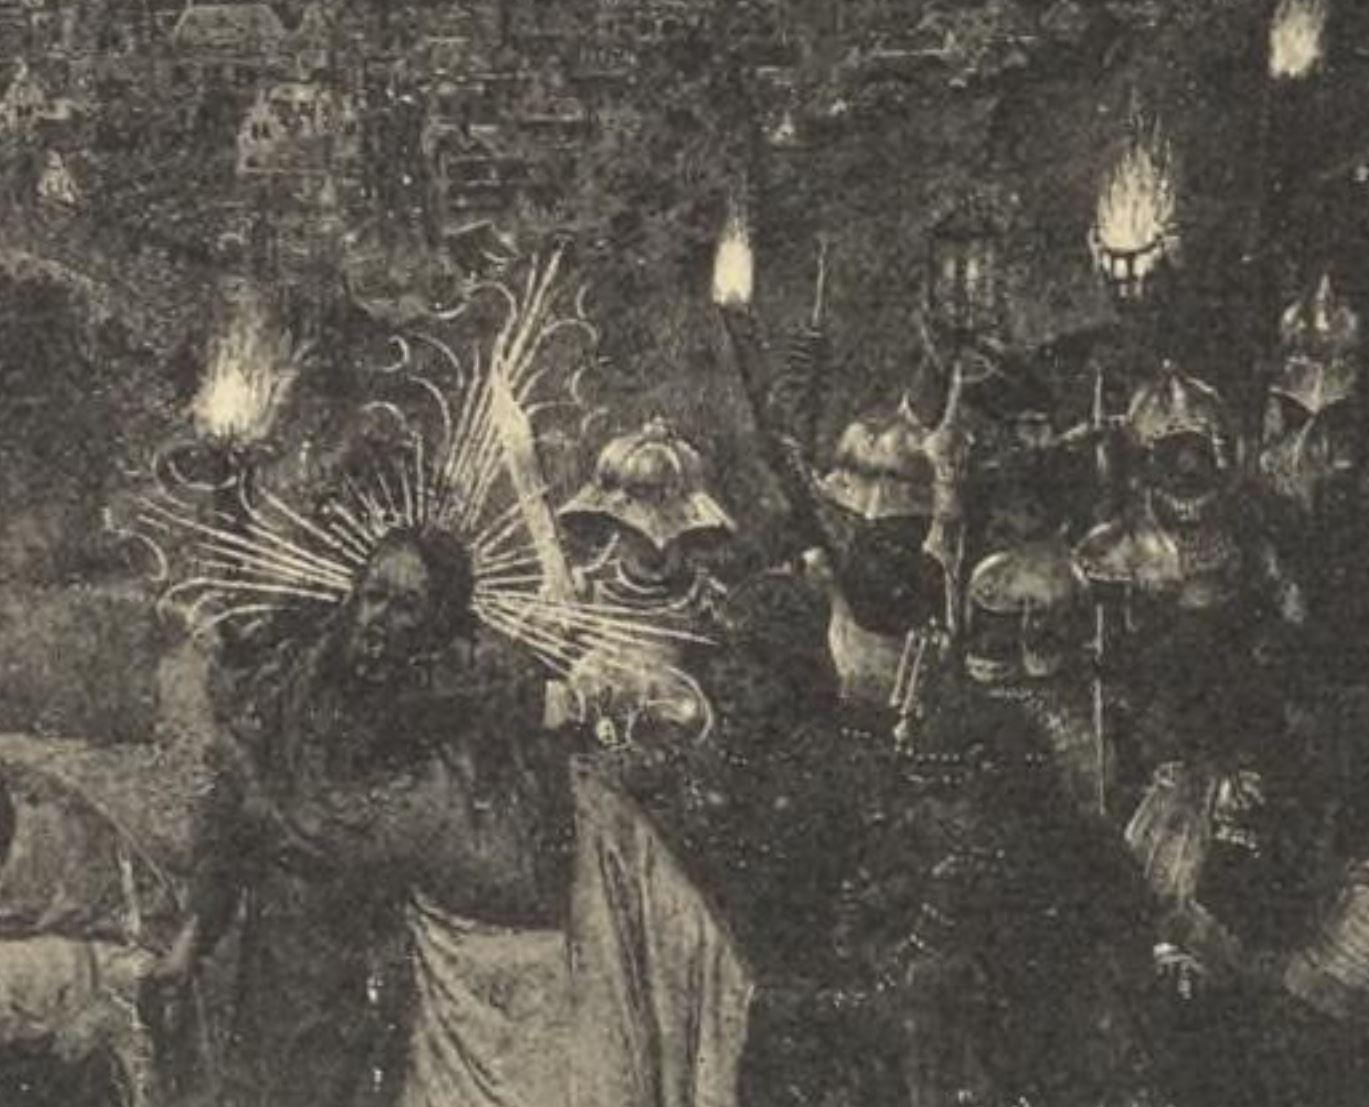 Heures de Turin Milan photo durrieu (detruit en 1904) fol 24 planche XV detail